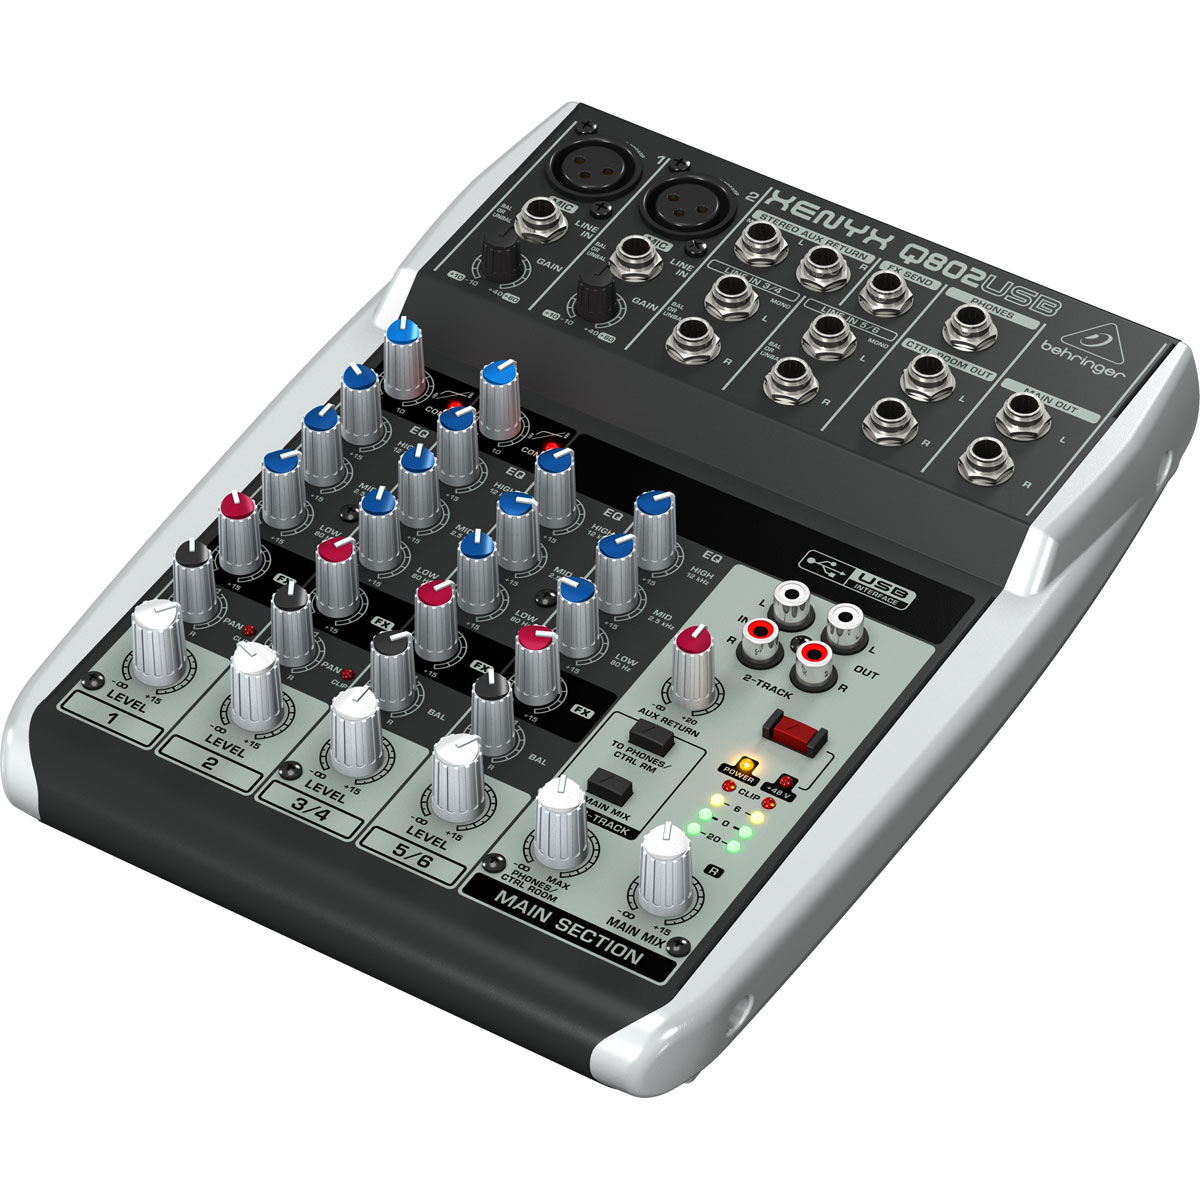 Mesa de Som 8 Canais Balanceados (2 XLR + 6 P10) c/ USB / Phantom / 1 Auxiliar - Xenyx Q 802 USB Behringer